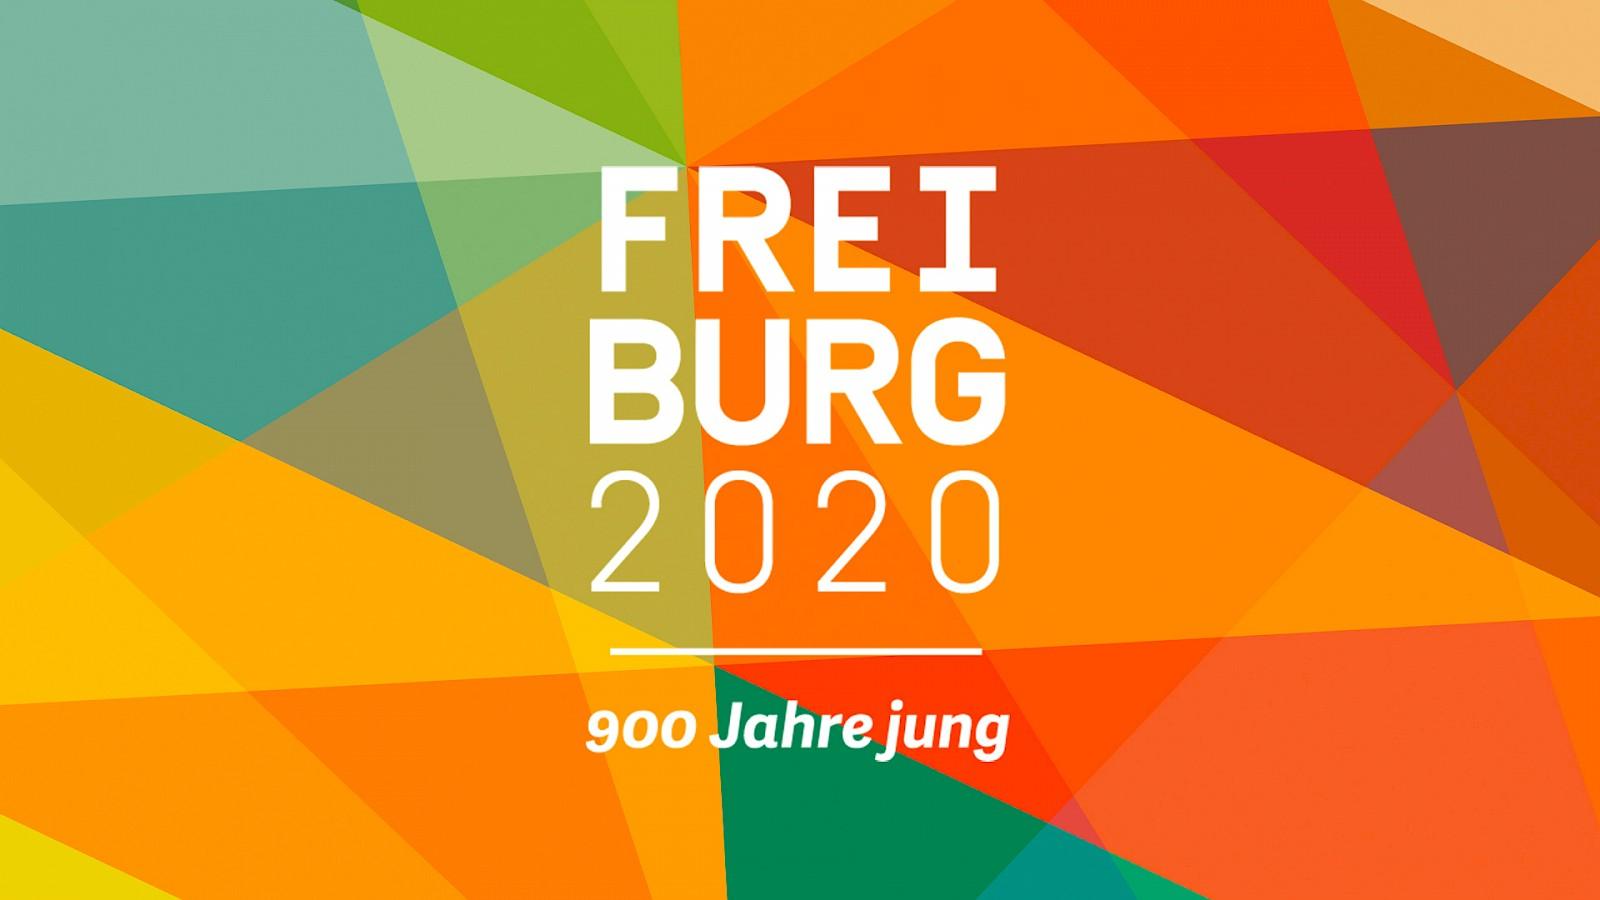 Freiburg 2020 – Design Visual, Quelle: designconcepts